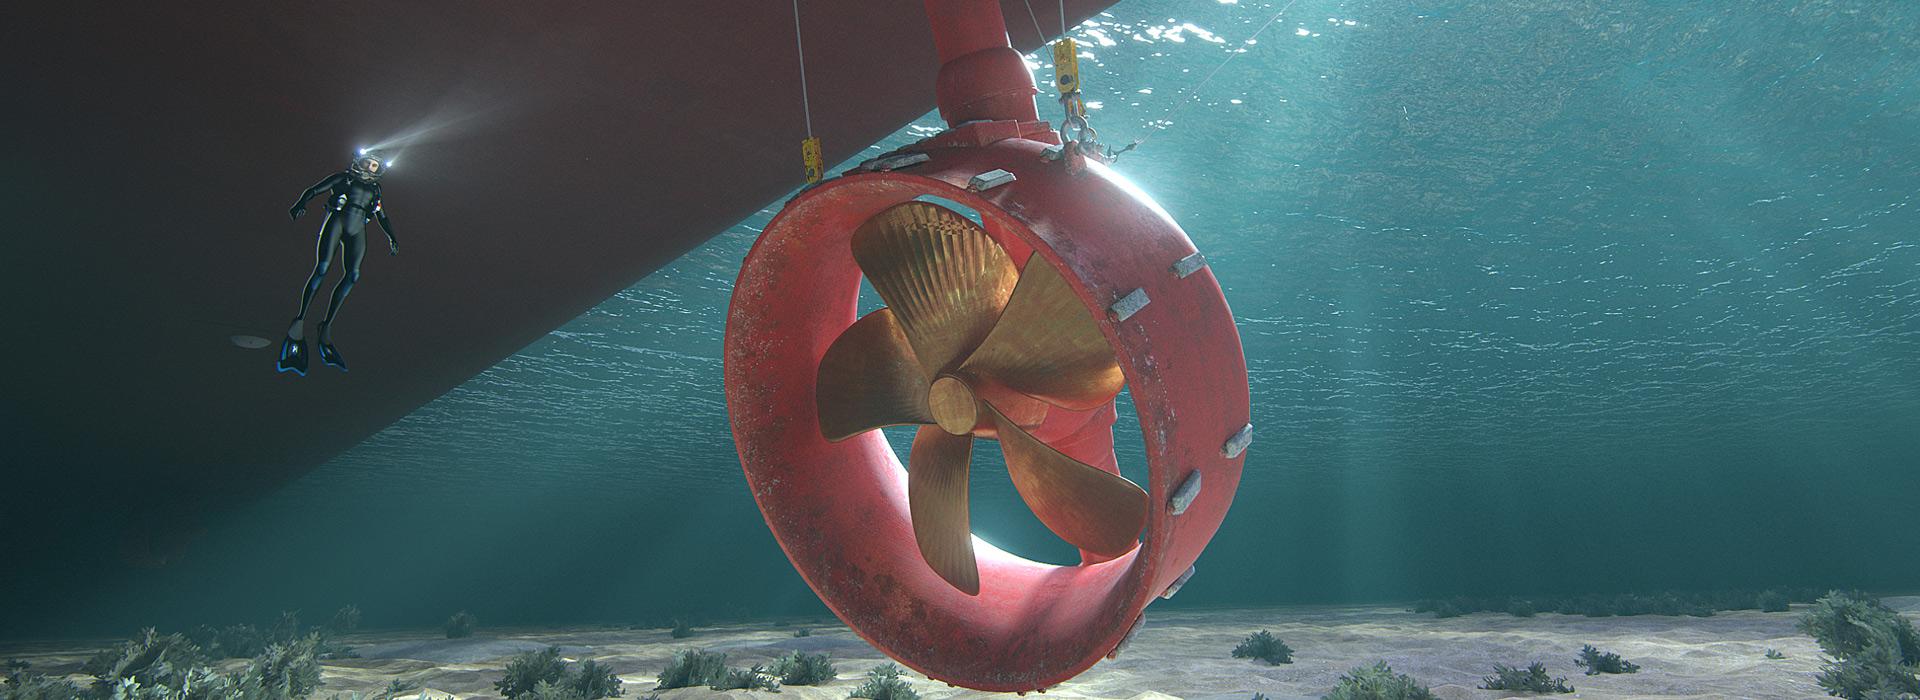 subsea-diver-thruster